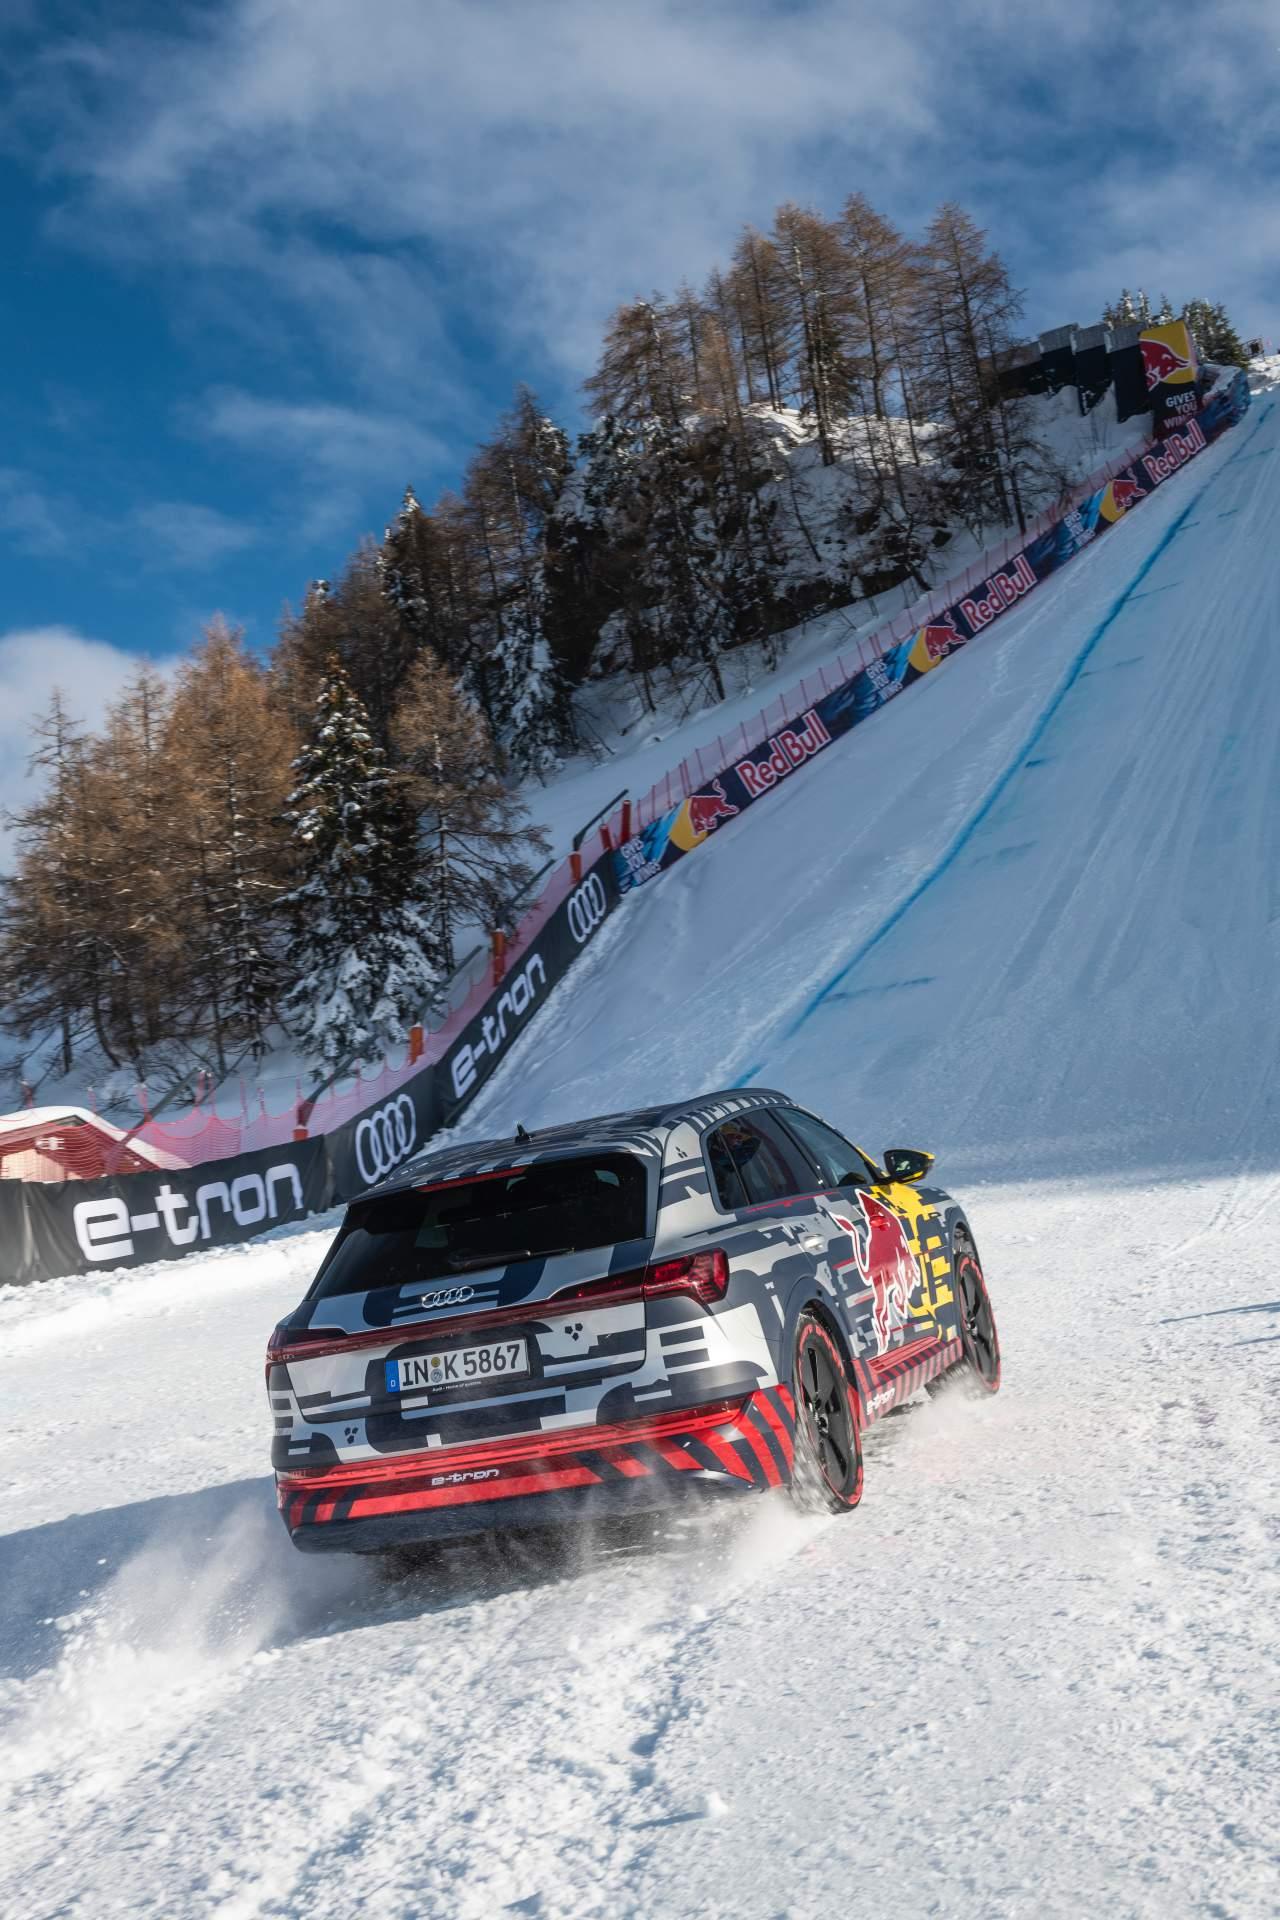 Audi E-Tron Ski (8)